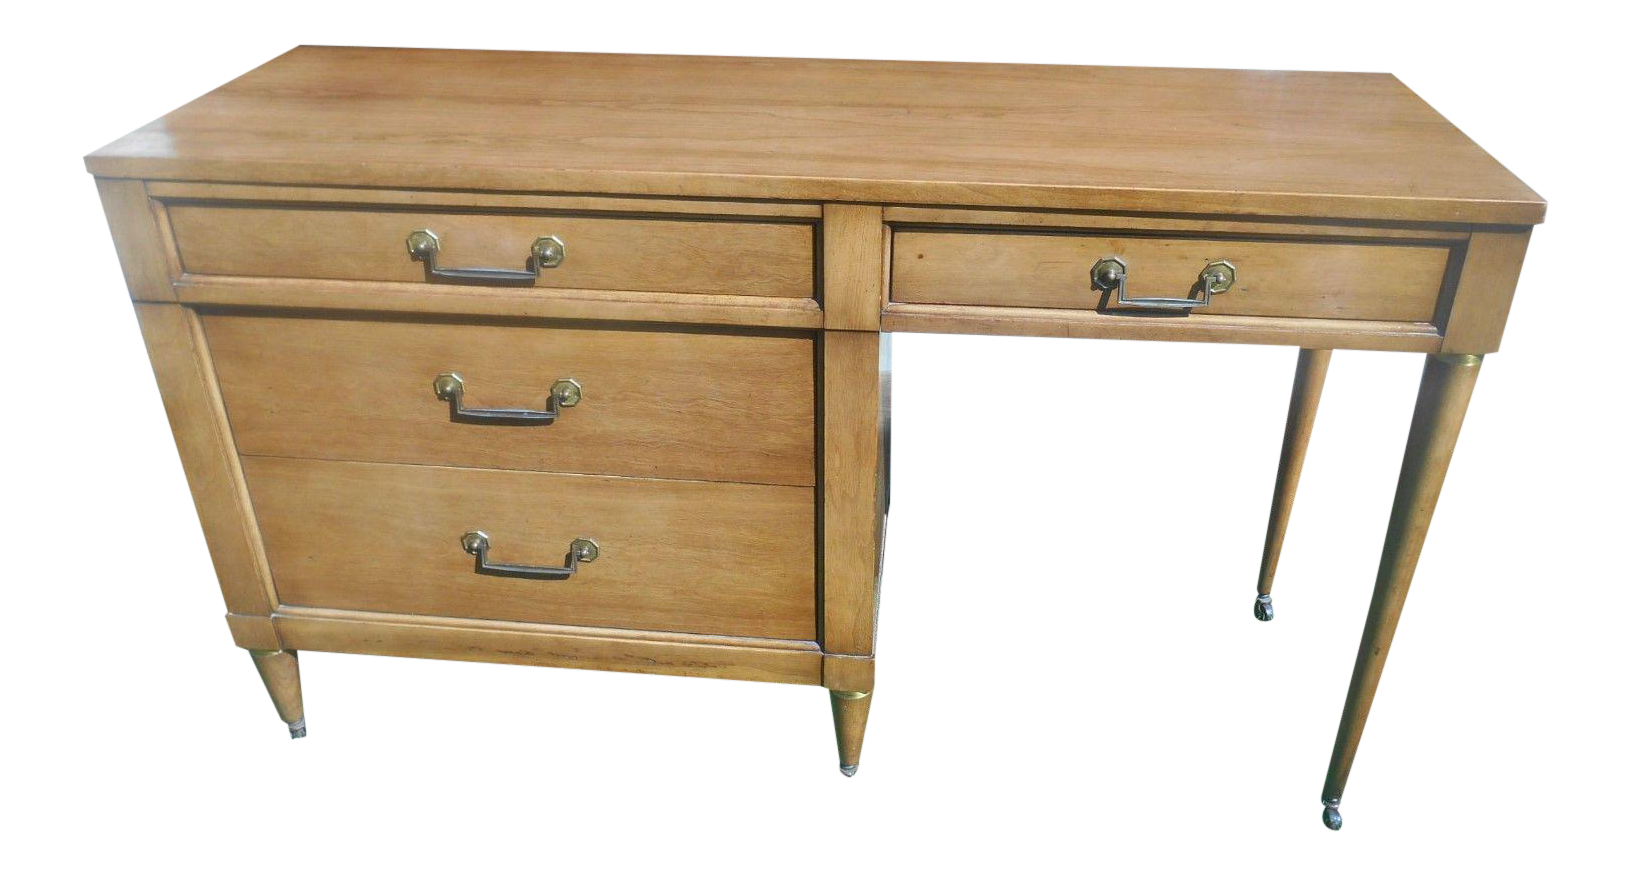 MidCentury Modern Style Desk by Century Furniture Chairish